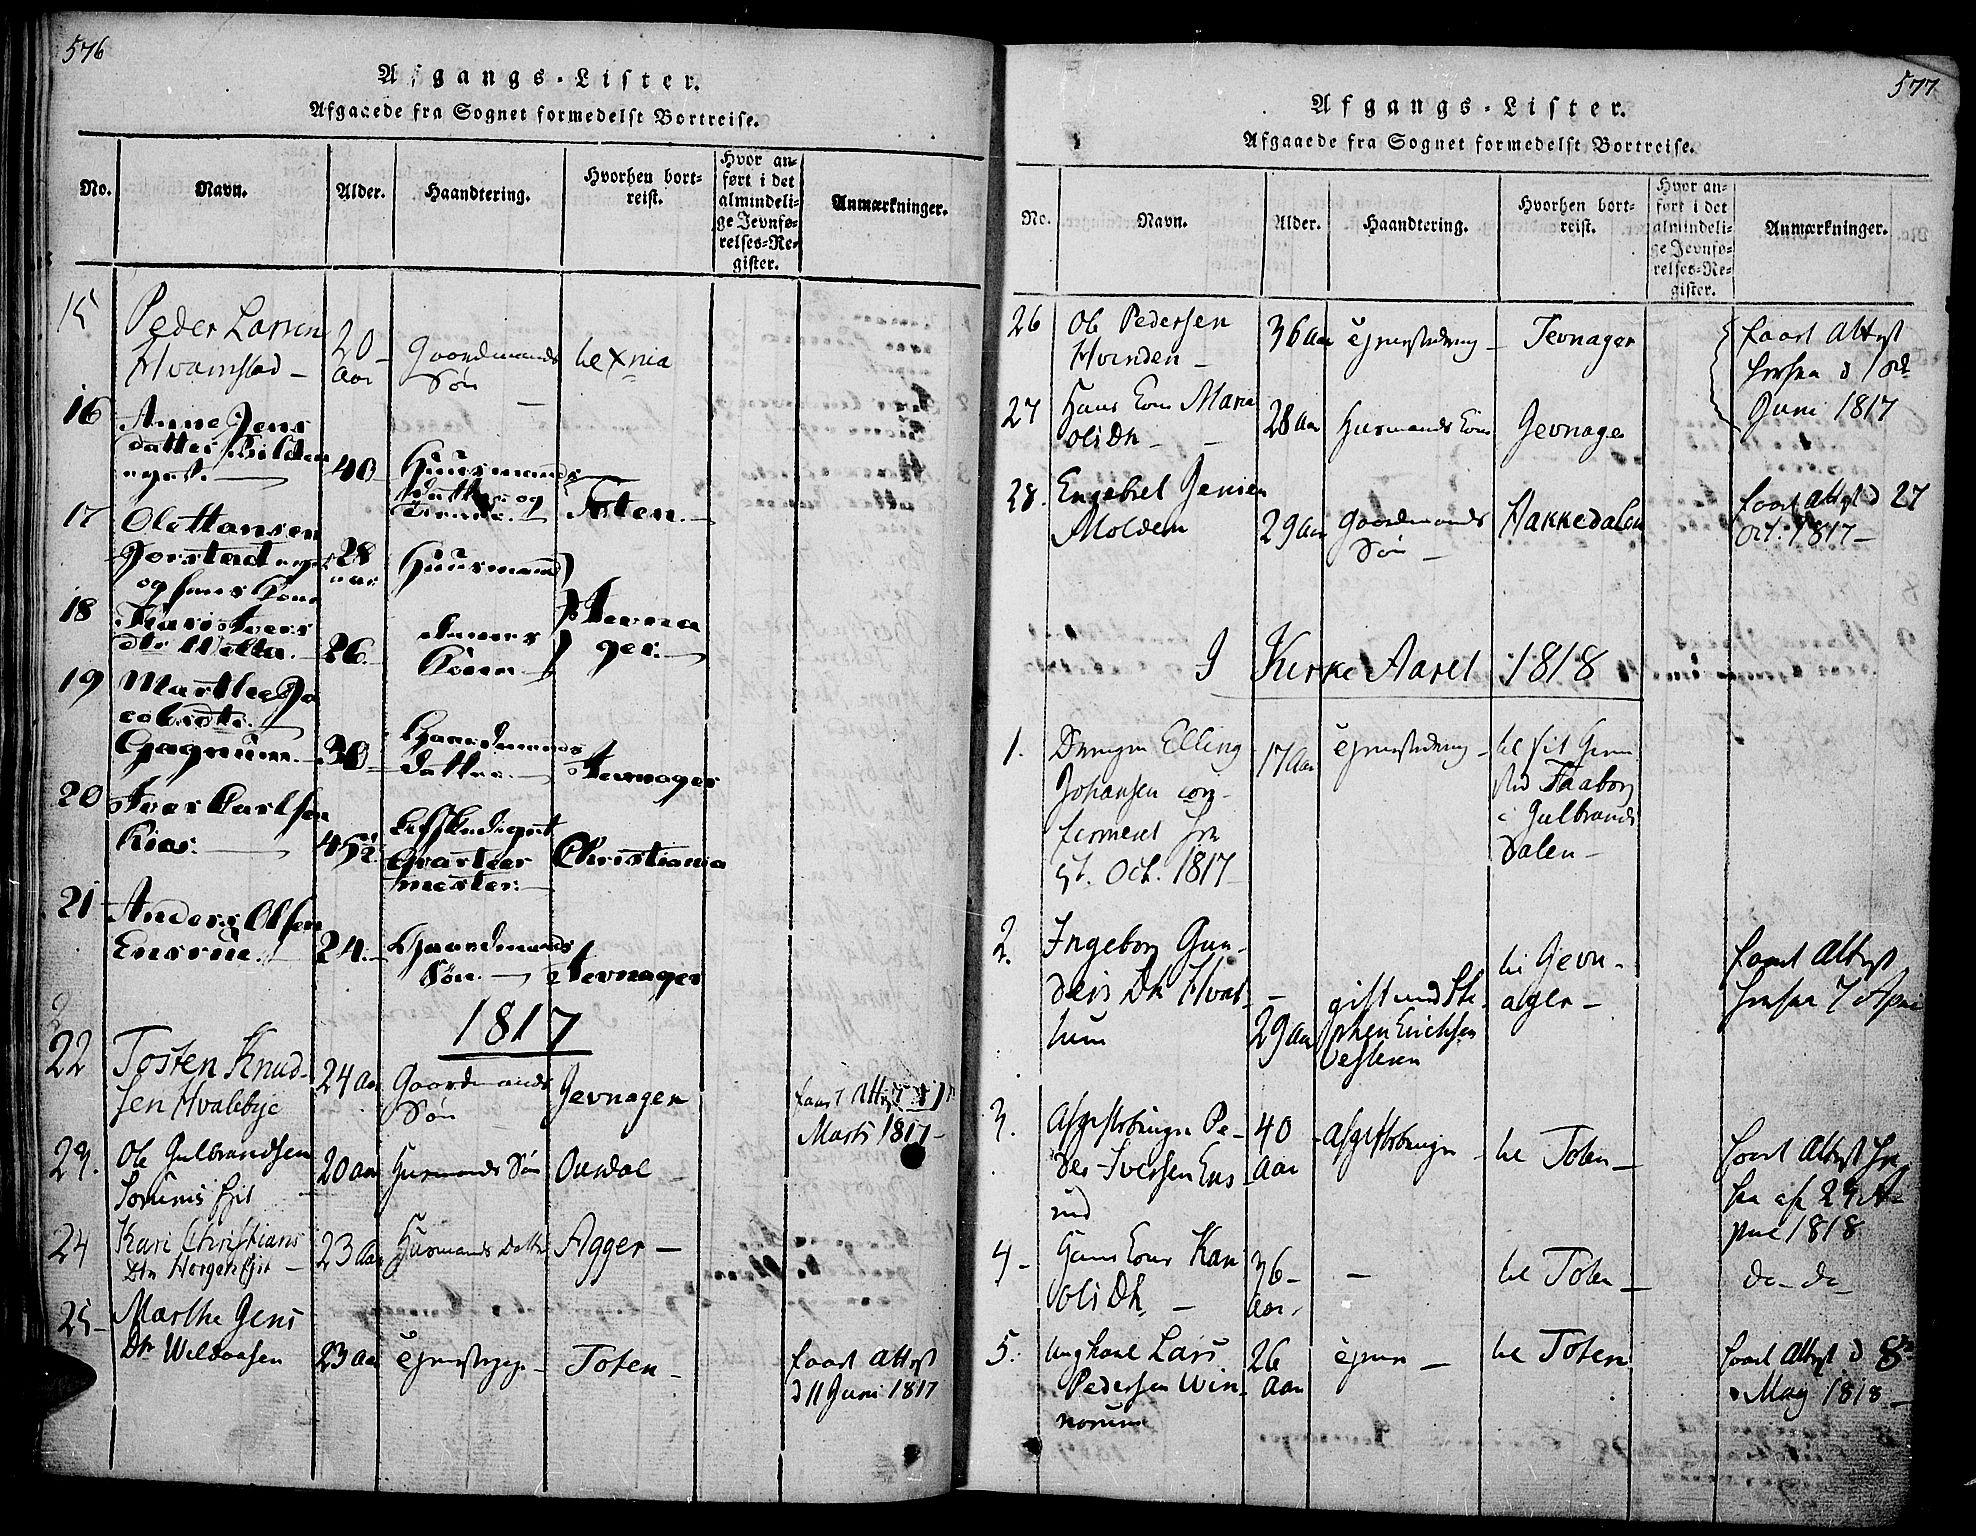 SAH, Gran prestekontor, Ministerialbok nr. 9, 1815-1824, s. 576-577